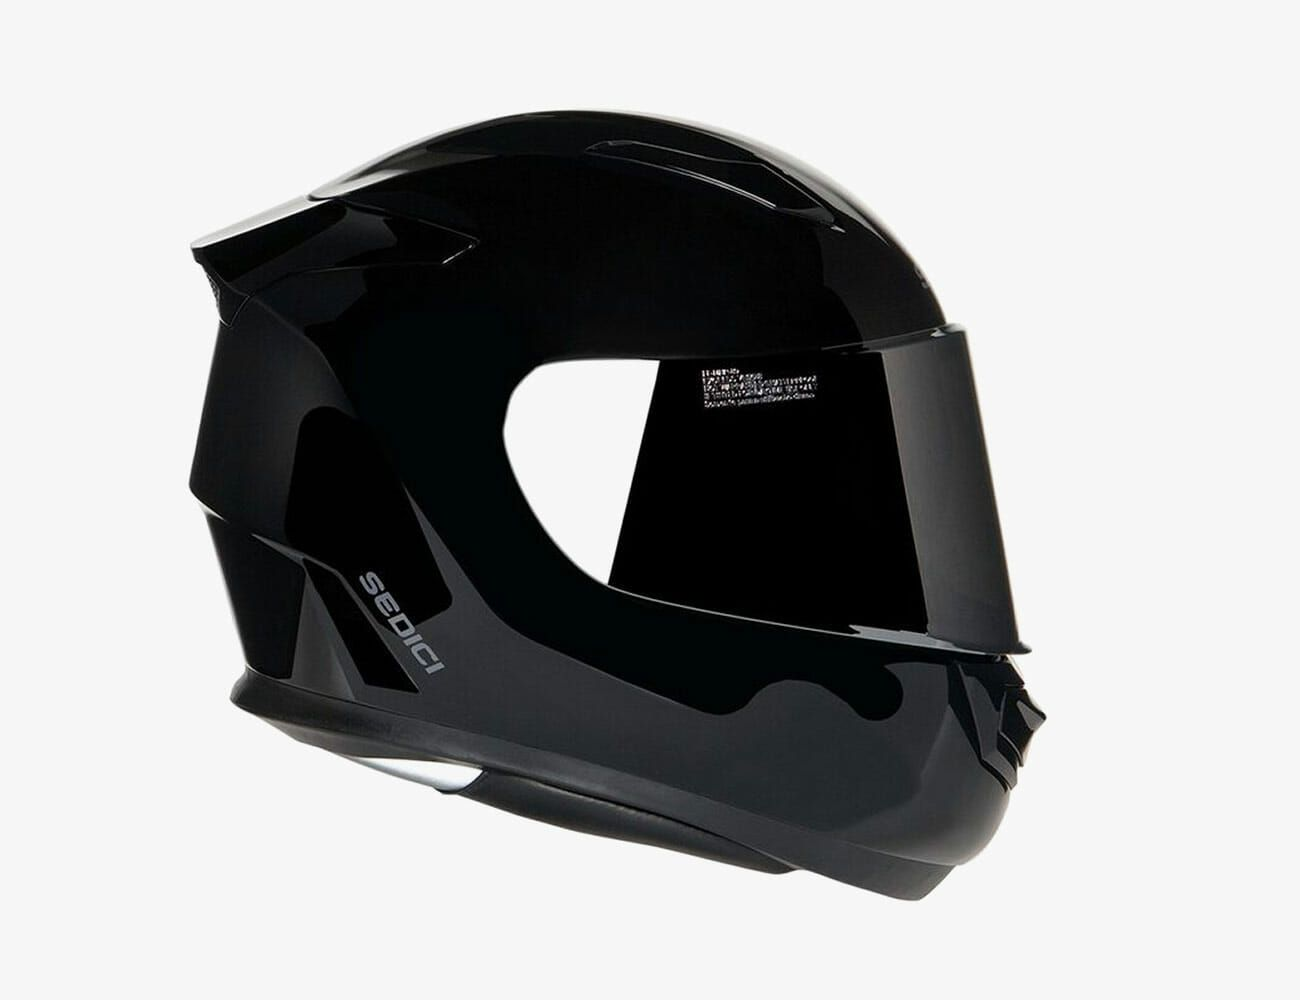 Some Of The Best New Motorcycle Helmets Of 2020  U2022 Gear Patrol